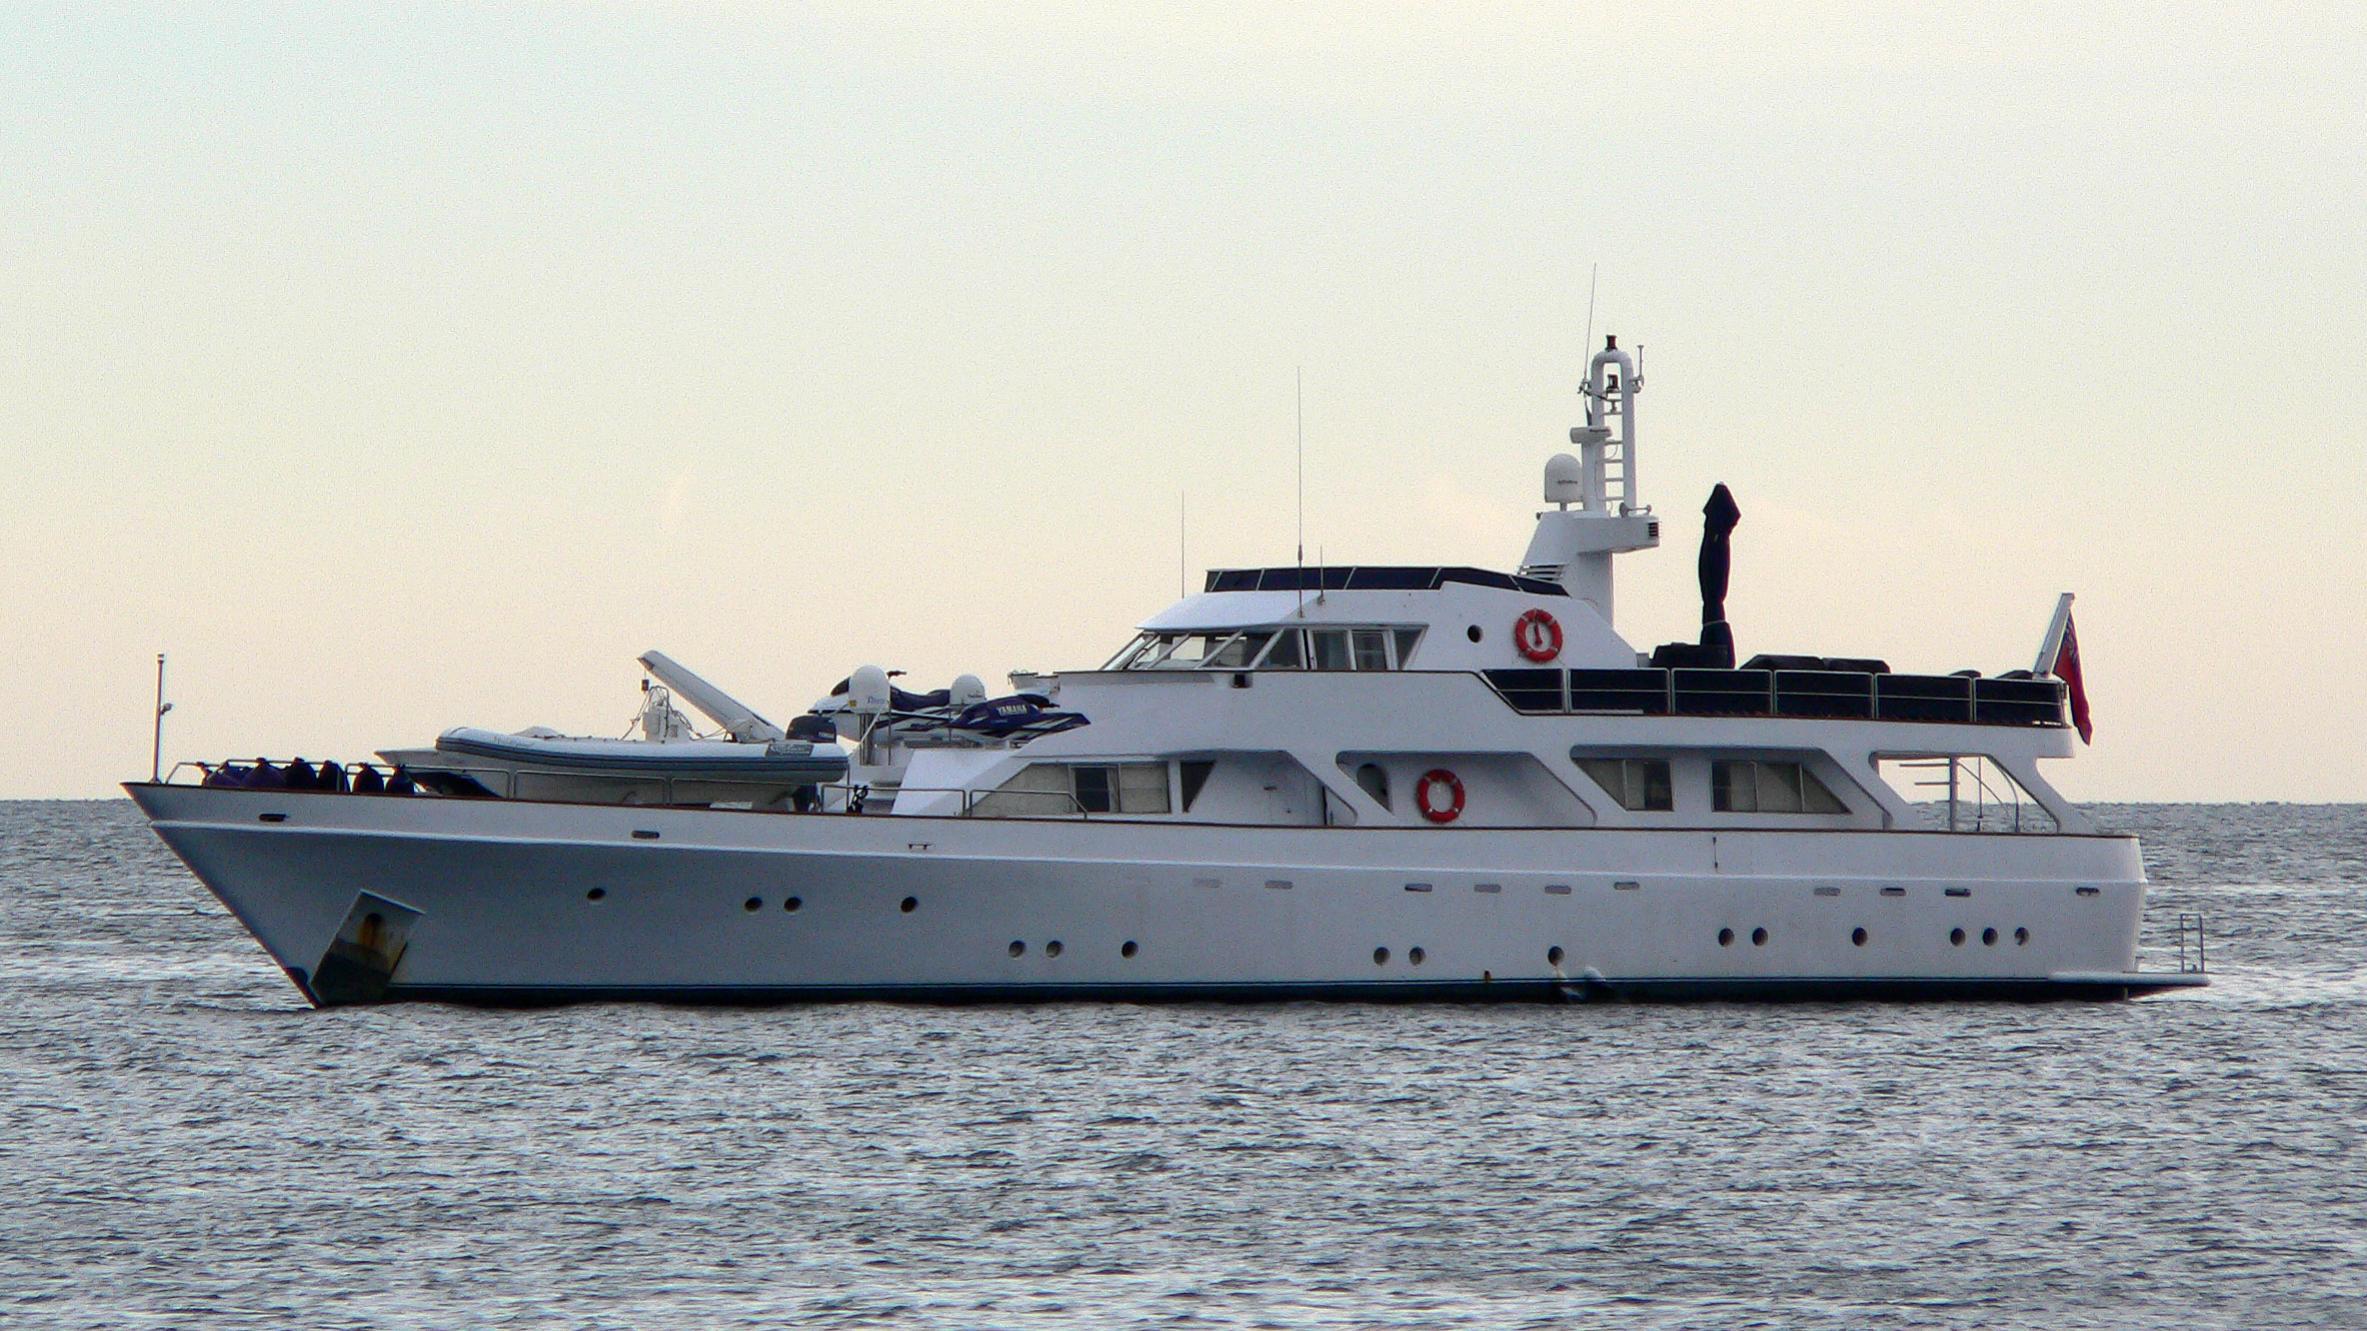 nomad-motor-yacht-proteksan-1977-32m-profile